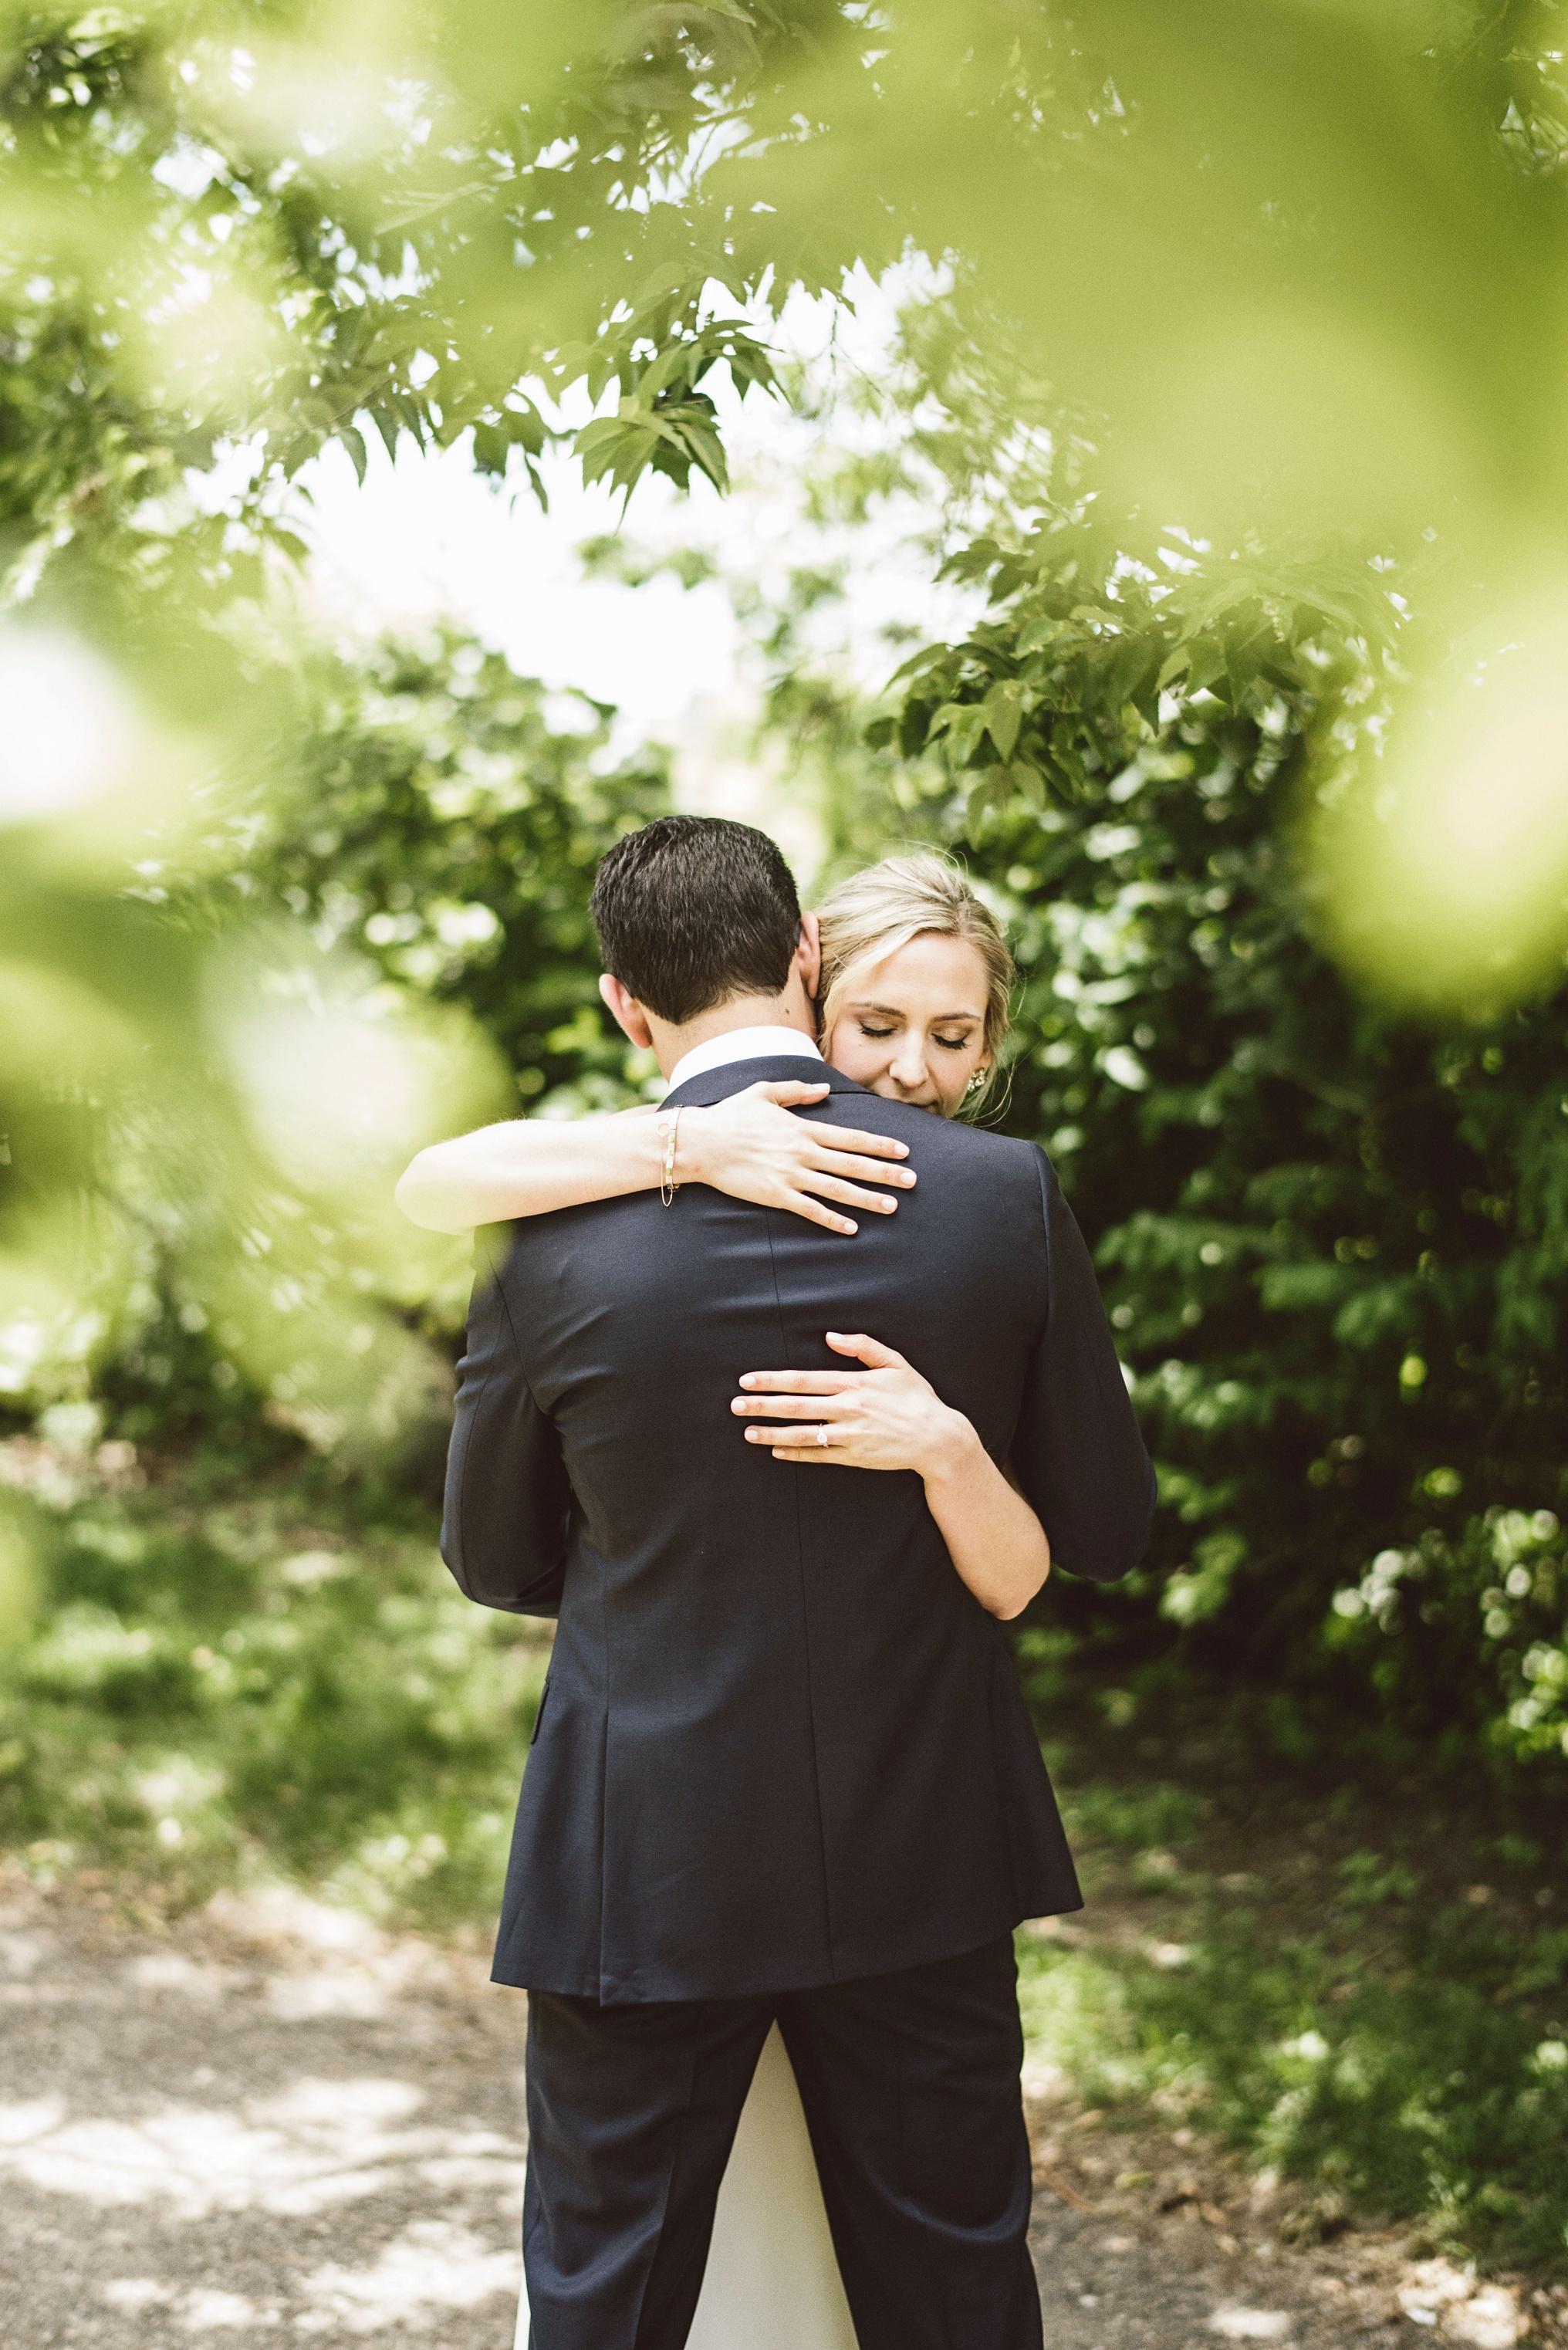 best_wedding_photography_2017_by_lucas_botz_photography_003.jpg